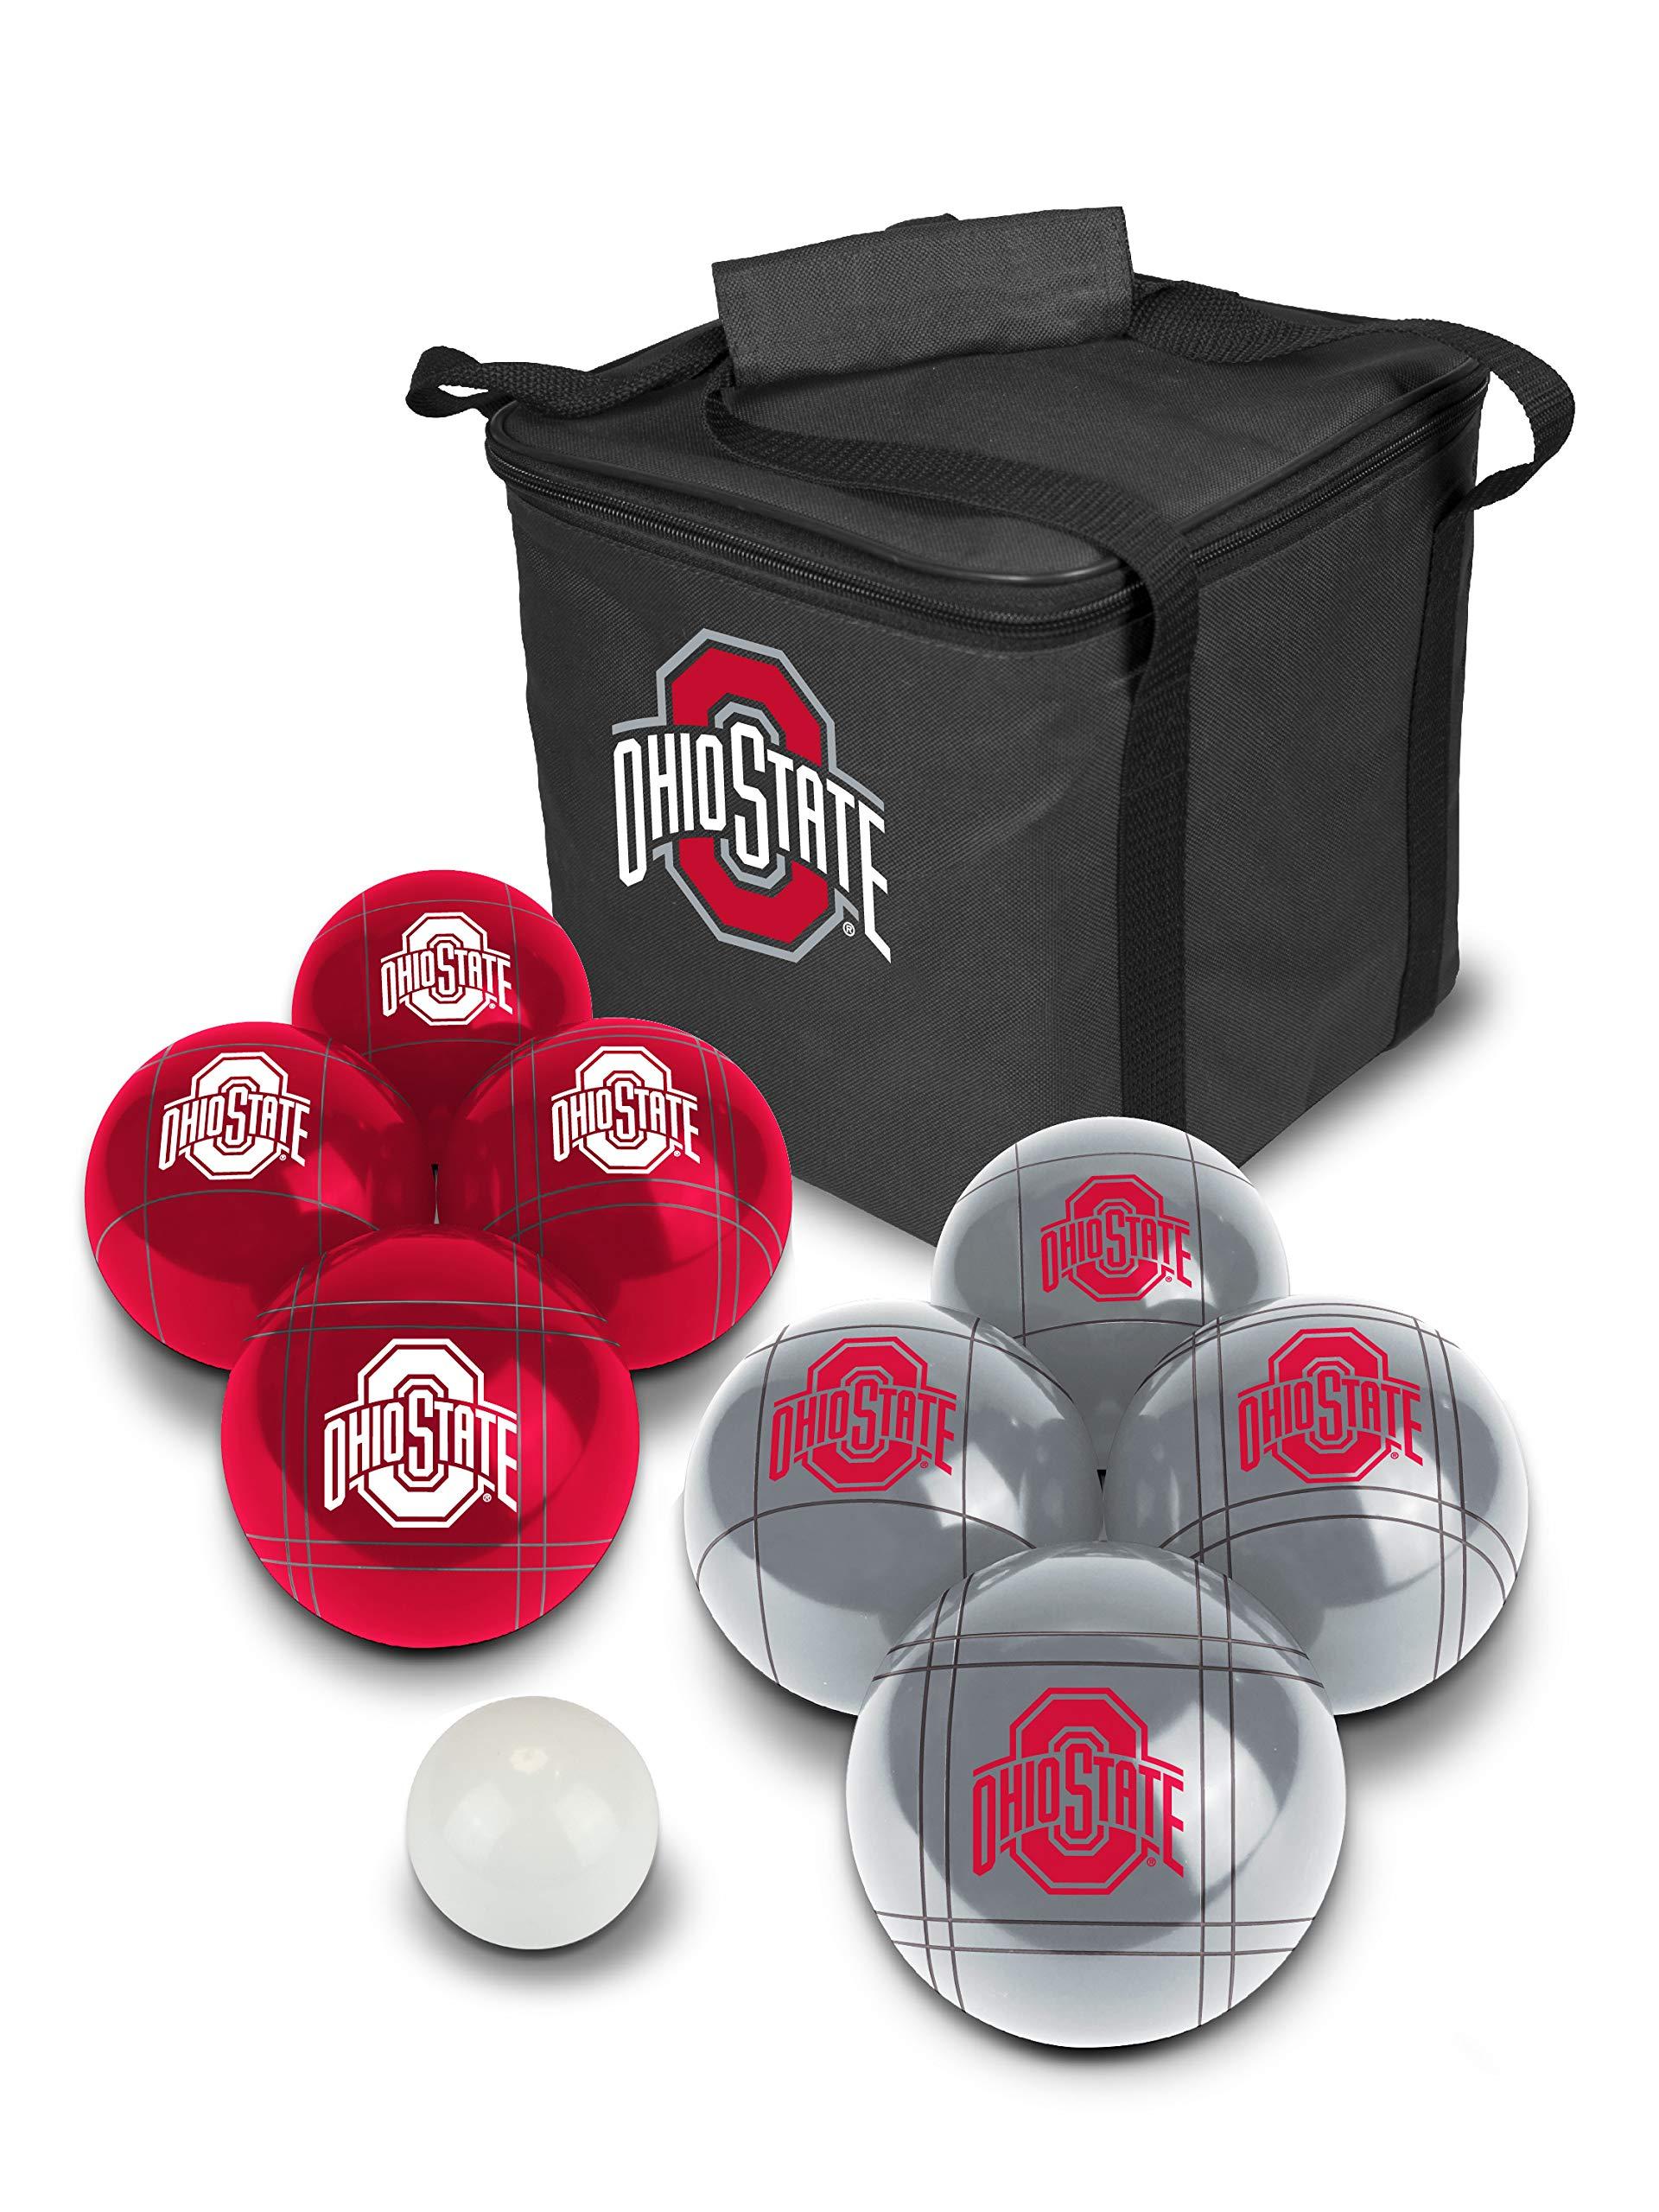 PROLINE NCAA College Ohio State Buckeyes Bocce Ball Set by PROLINE